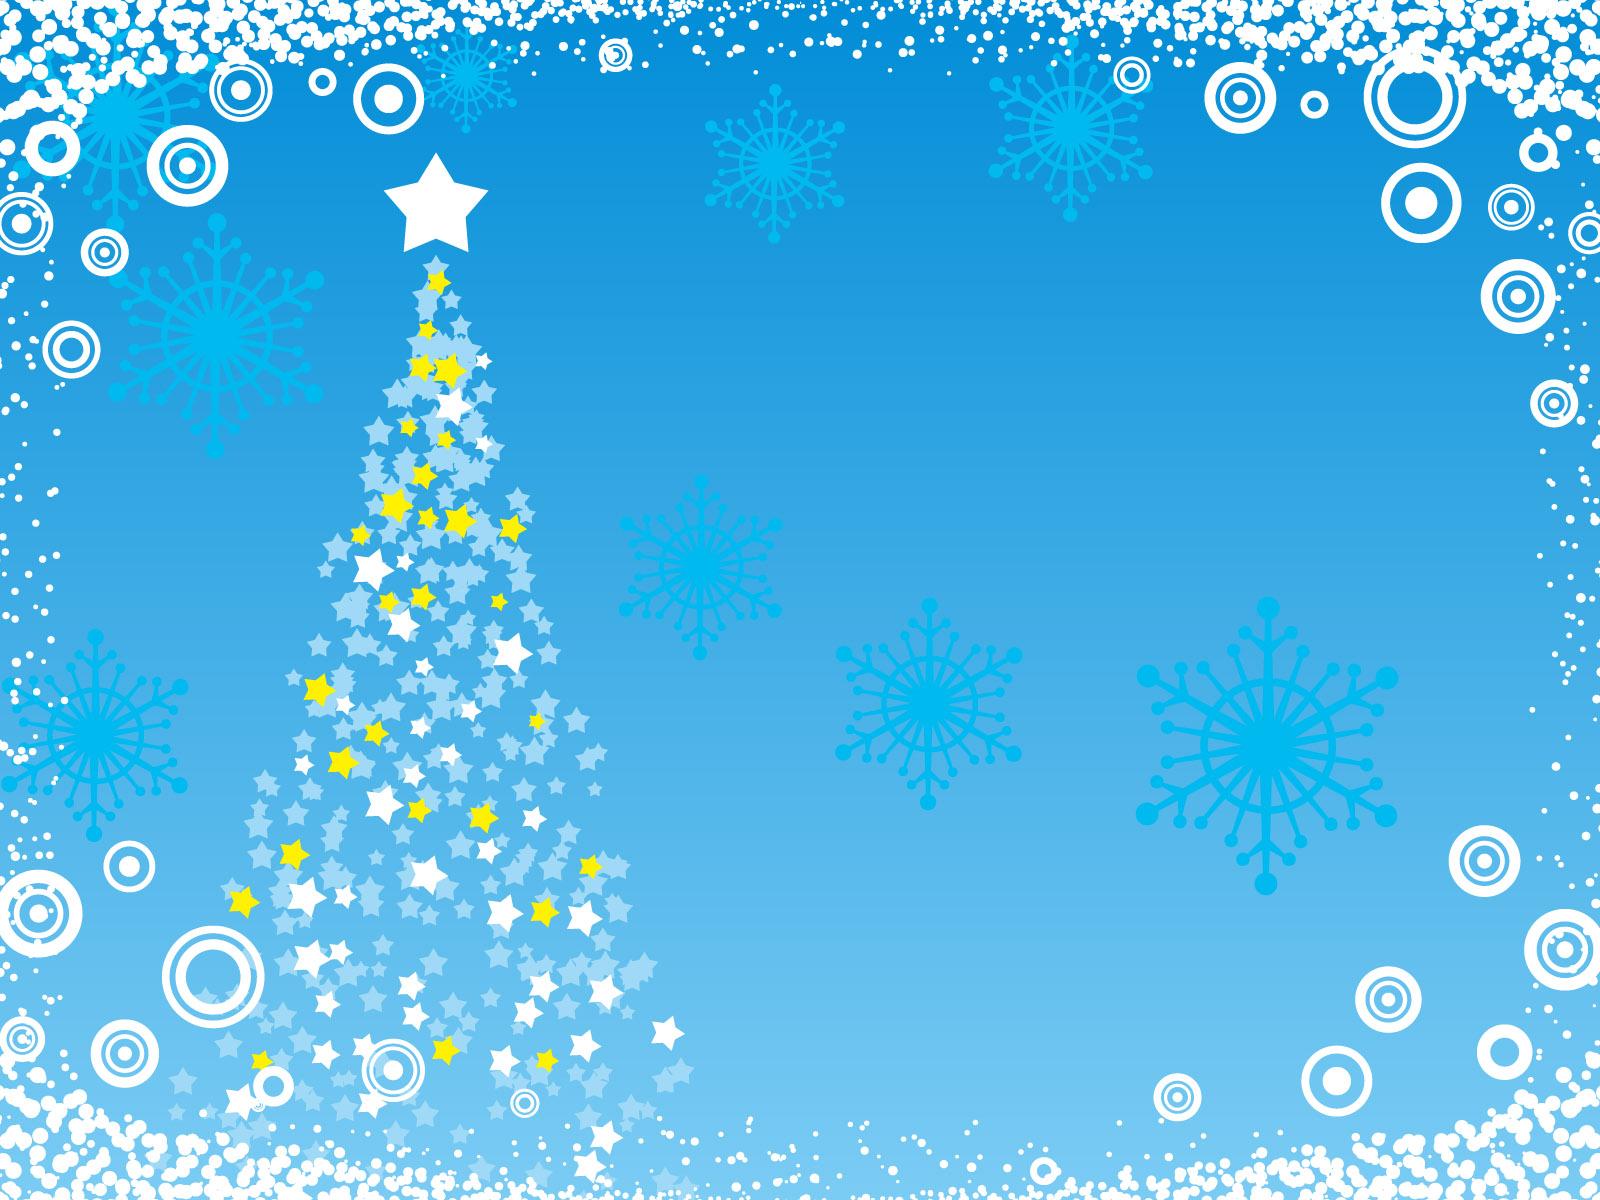 Season greetings blue hd wallpaper home of wallpapers free season greetings blue hd wallpaper m4hsunfo